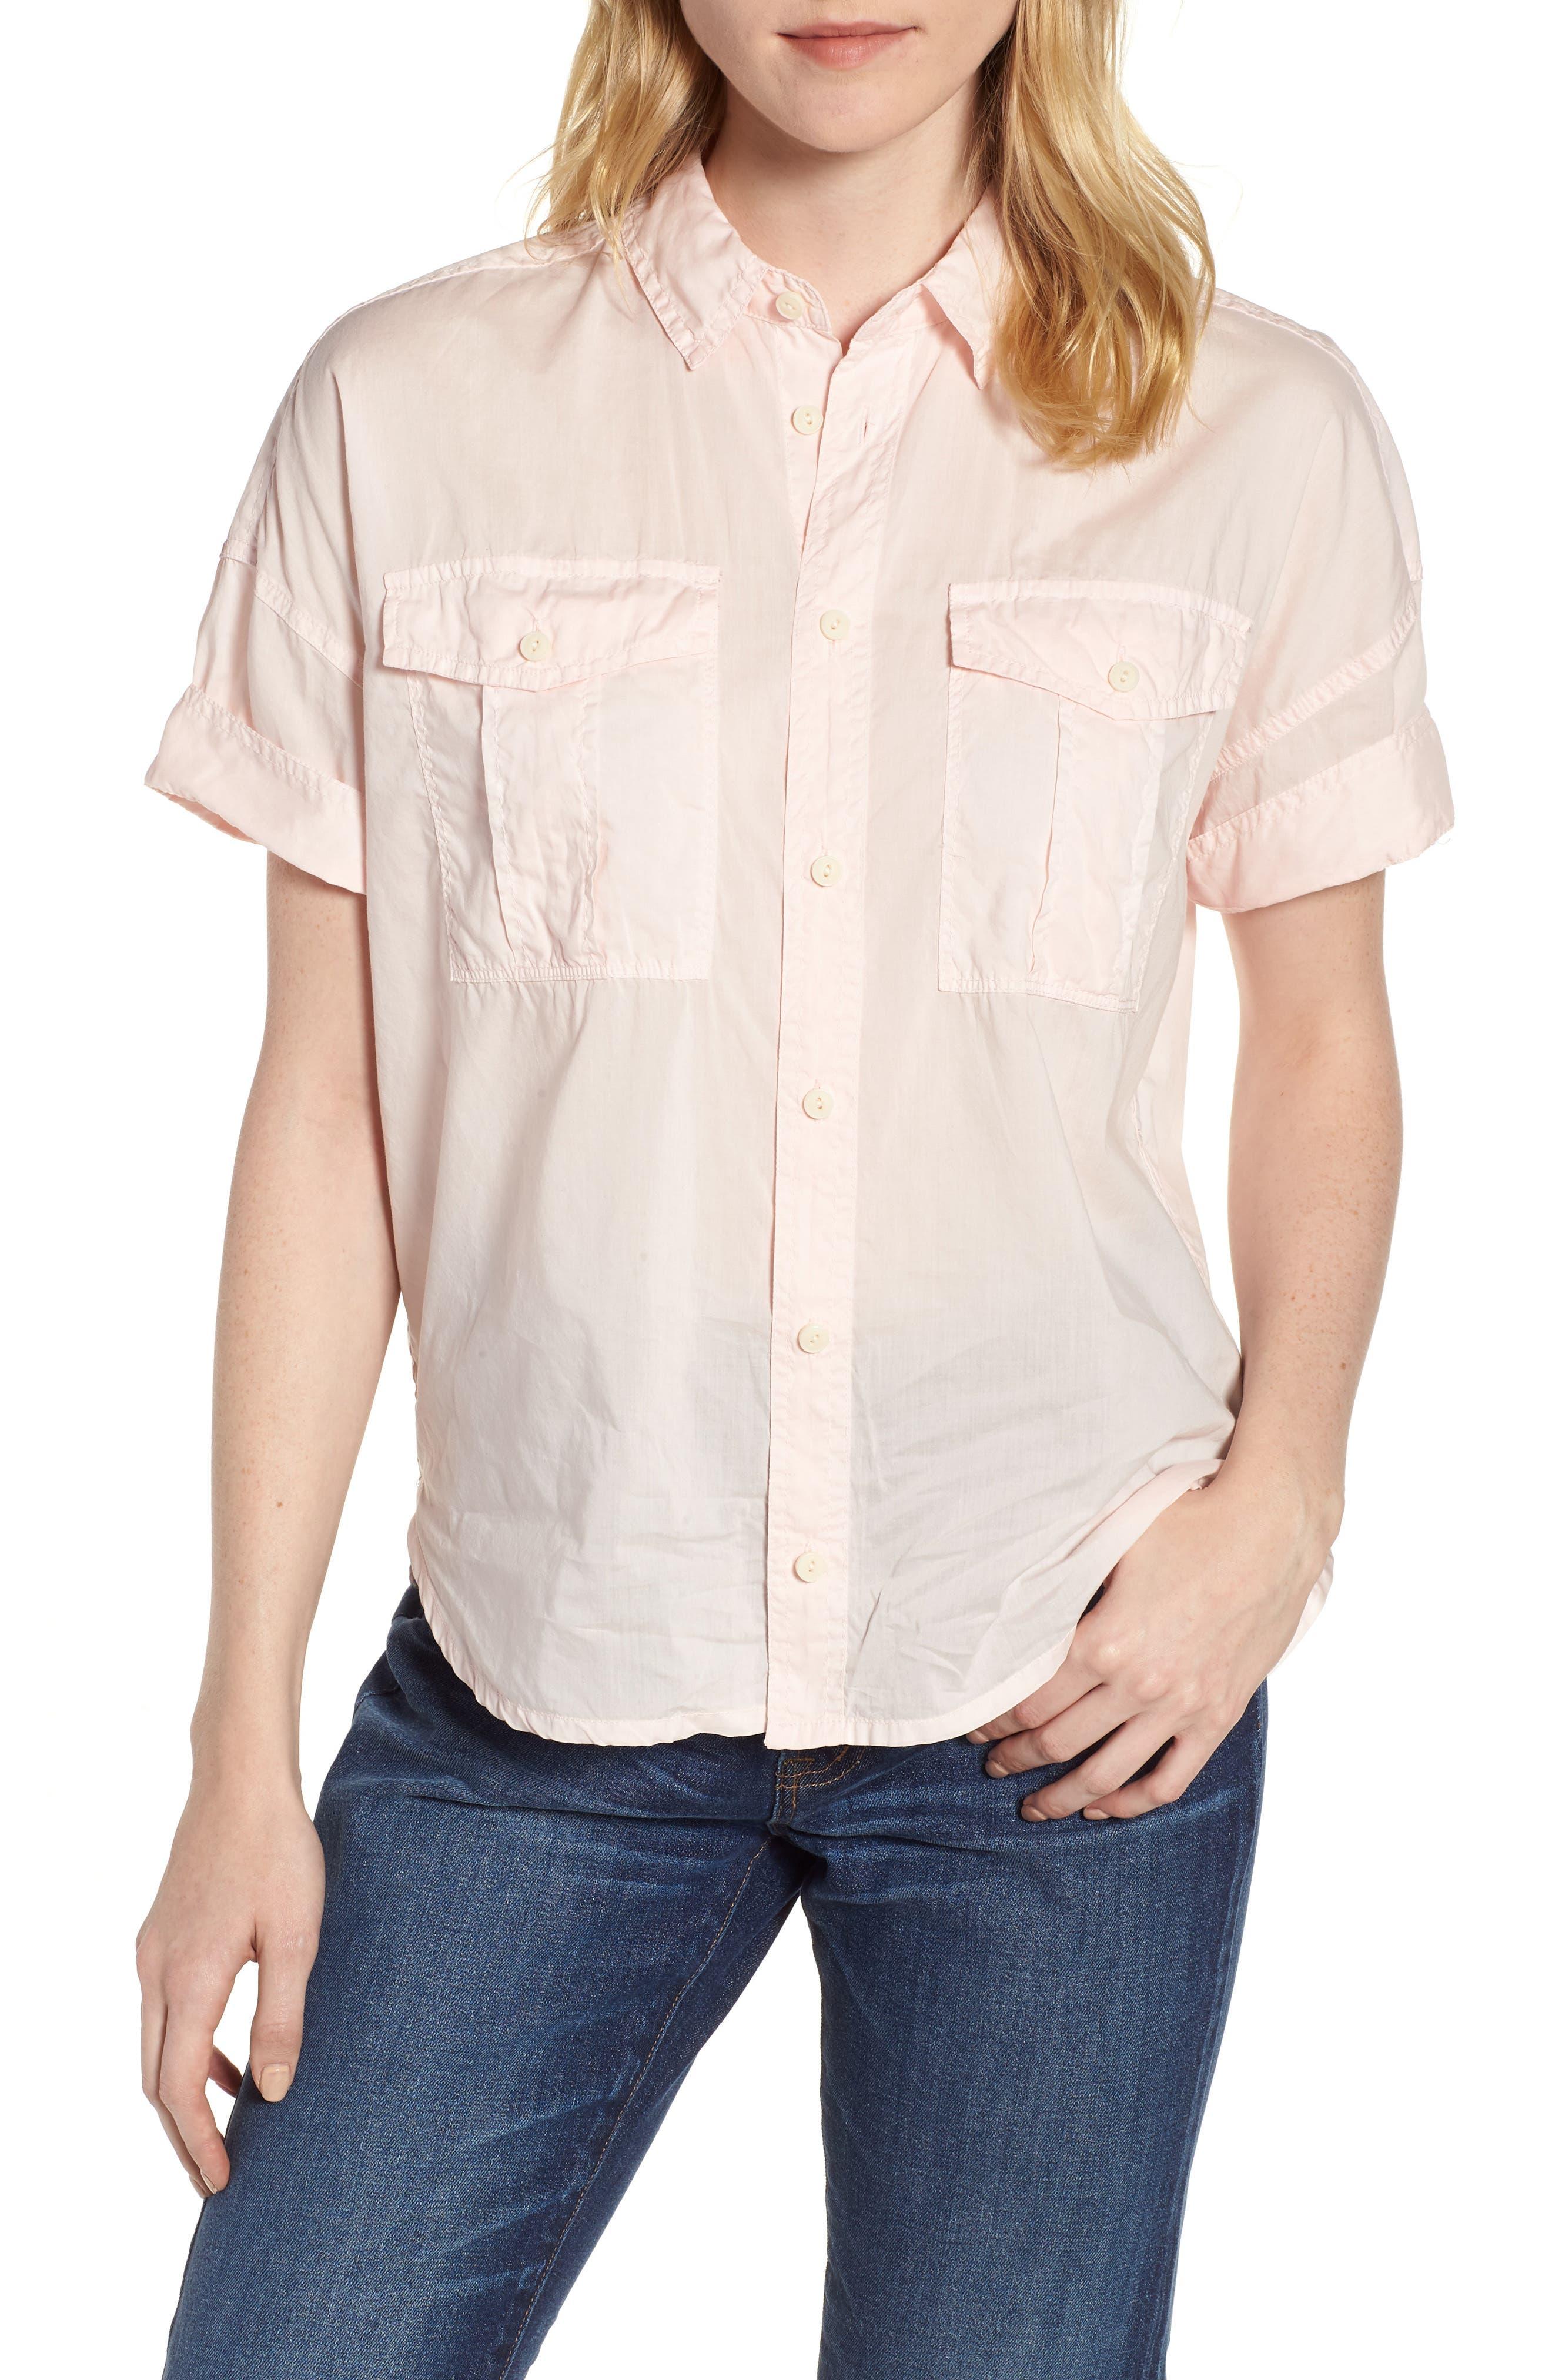 J.Crew Utility Pocket Shirt,                         Main,                         color, Pastel Pink